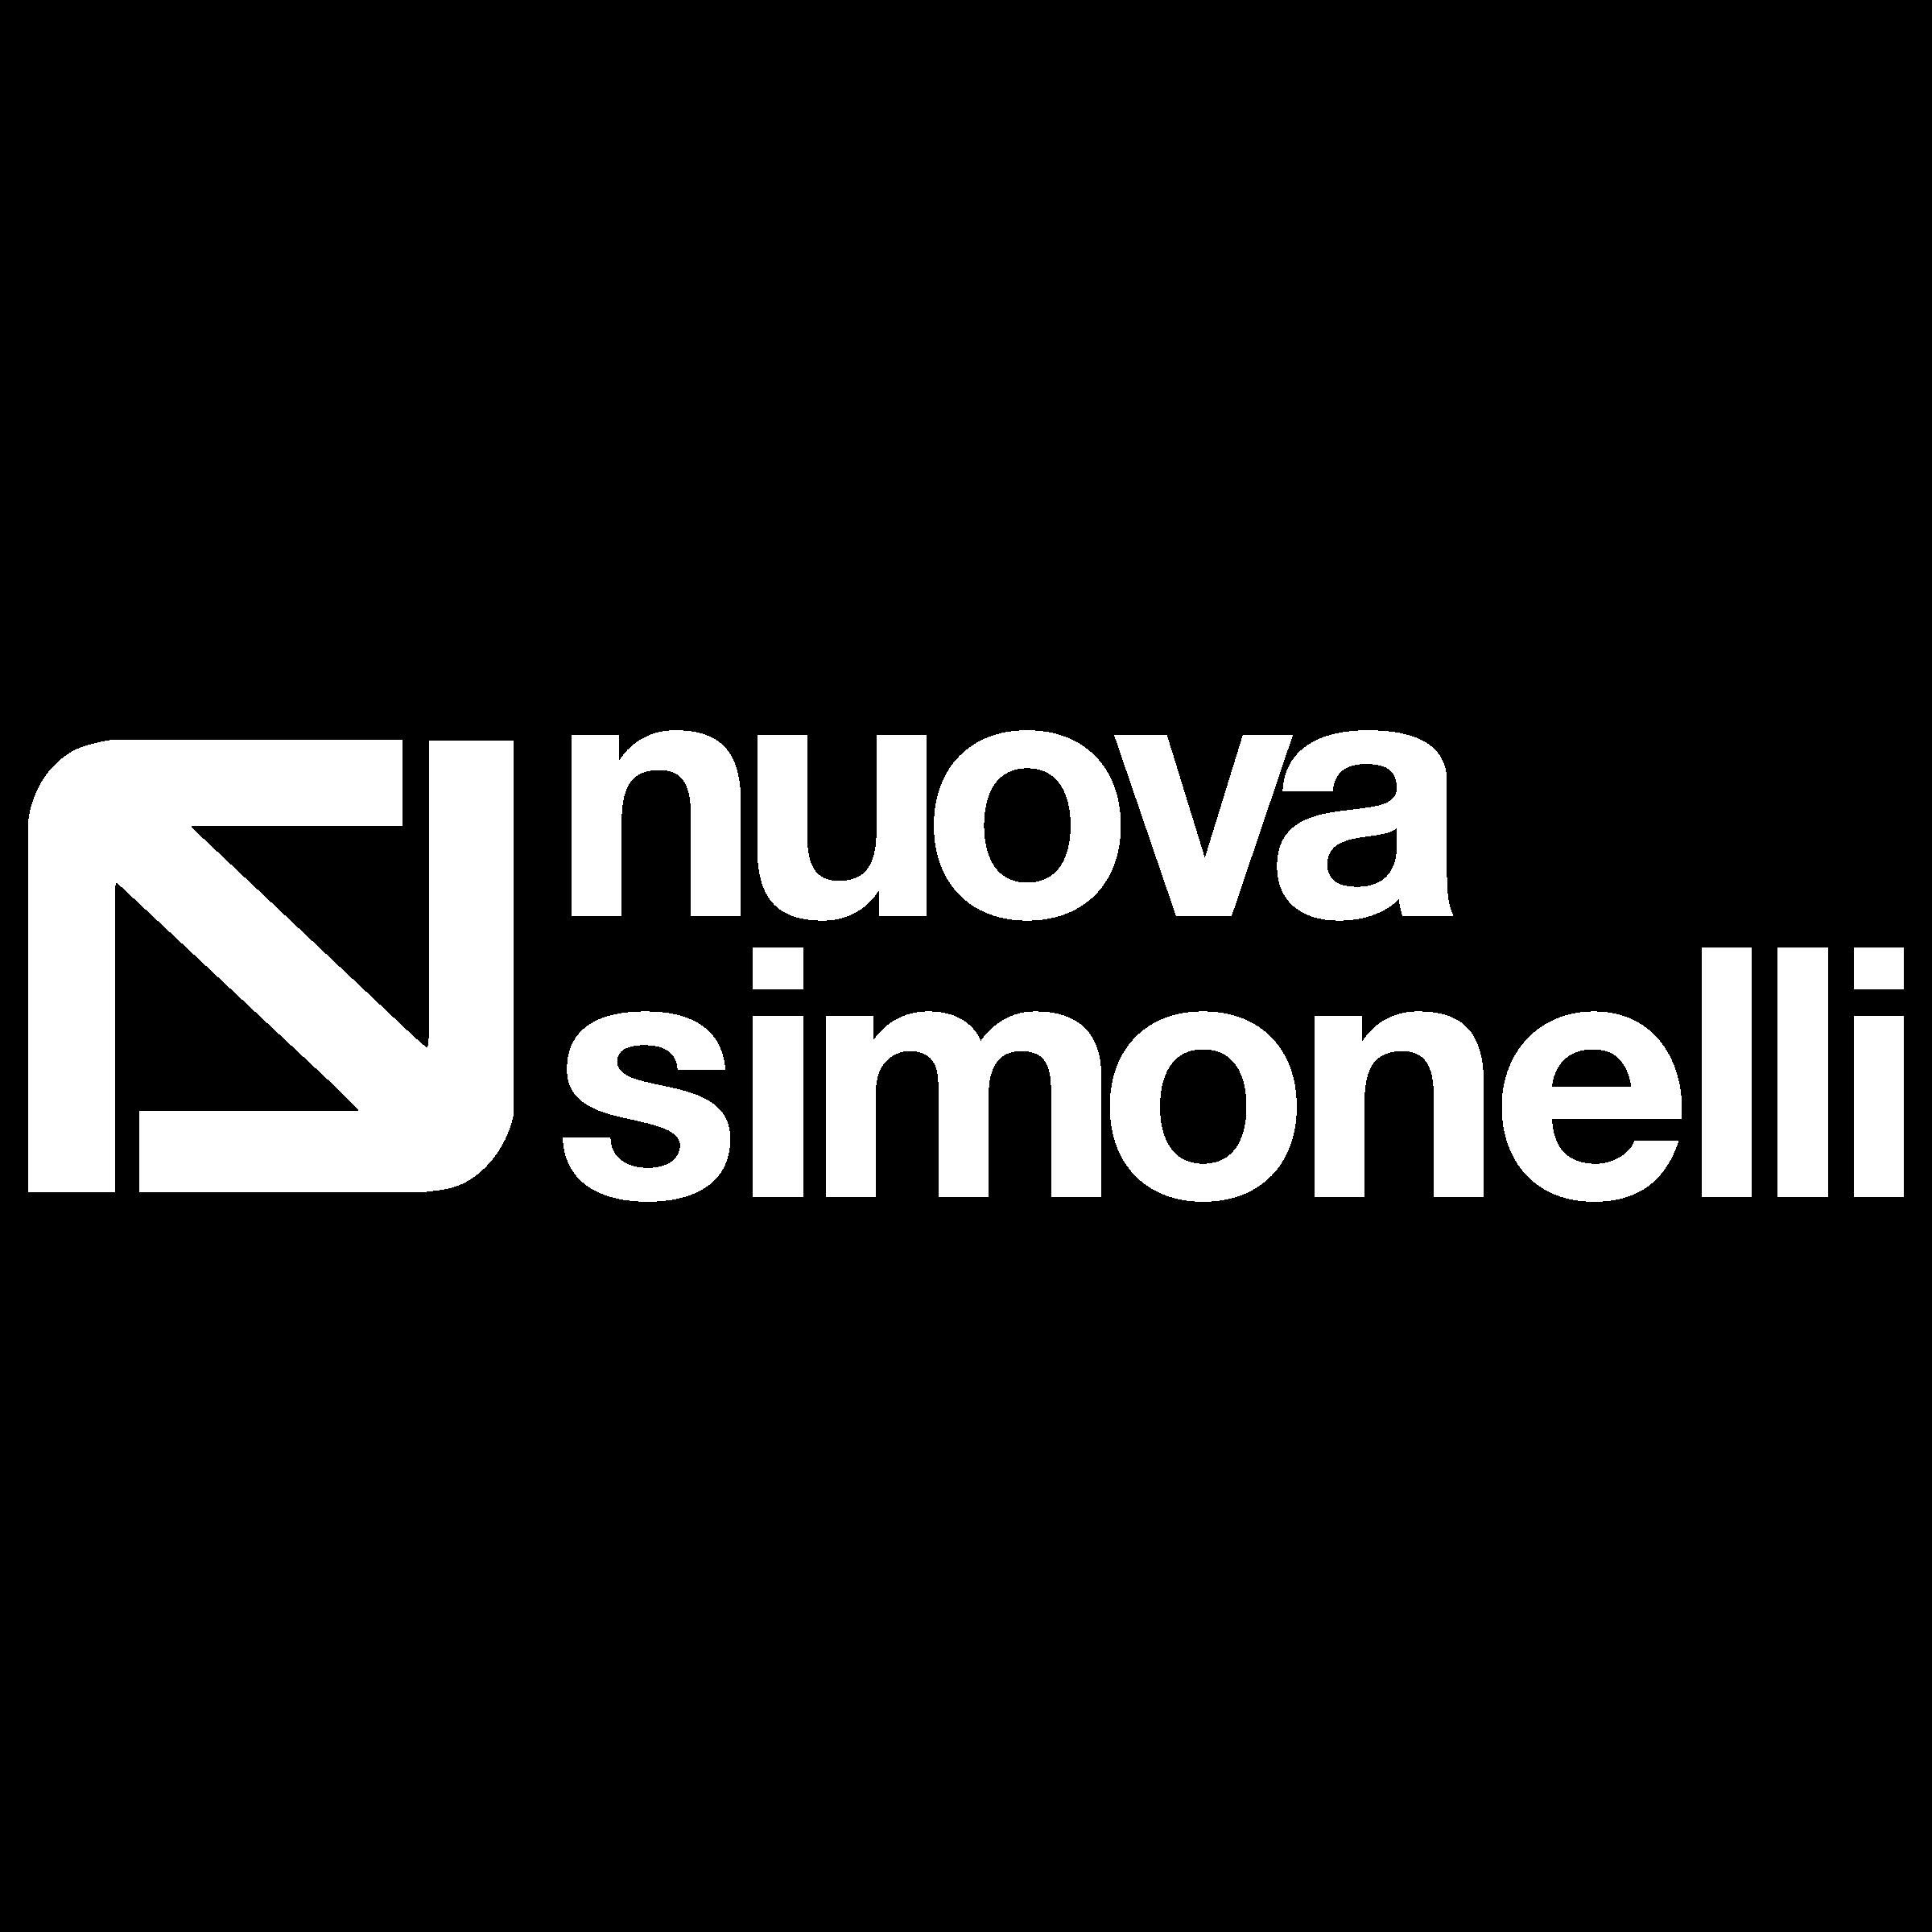 nuova-simonelli-logo-png-transparent.png